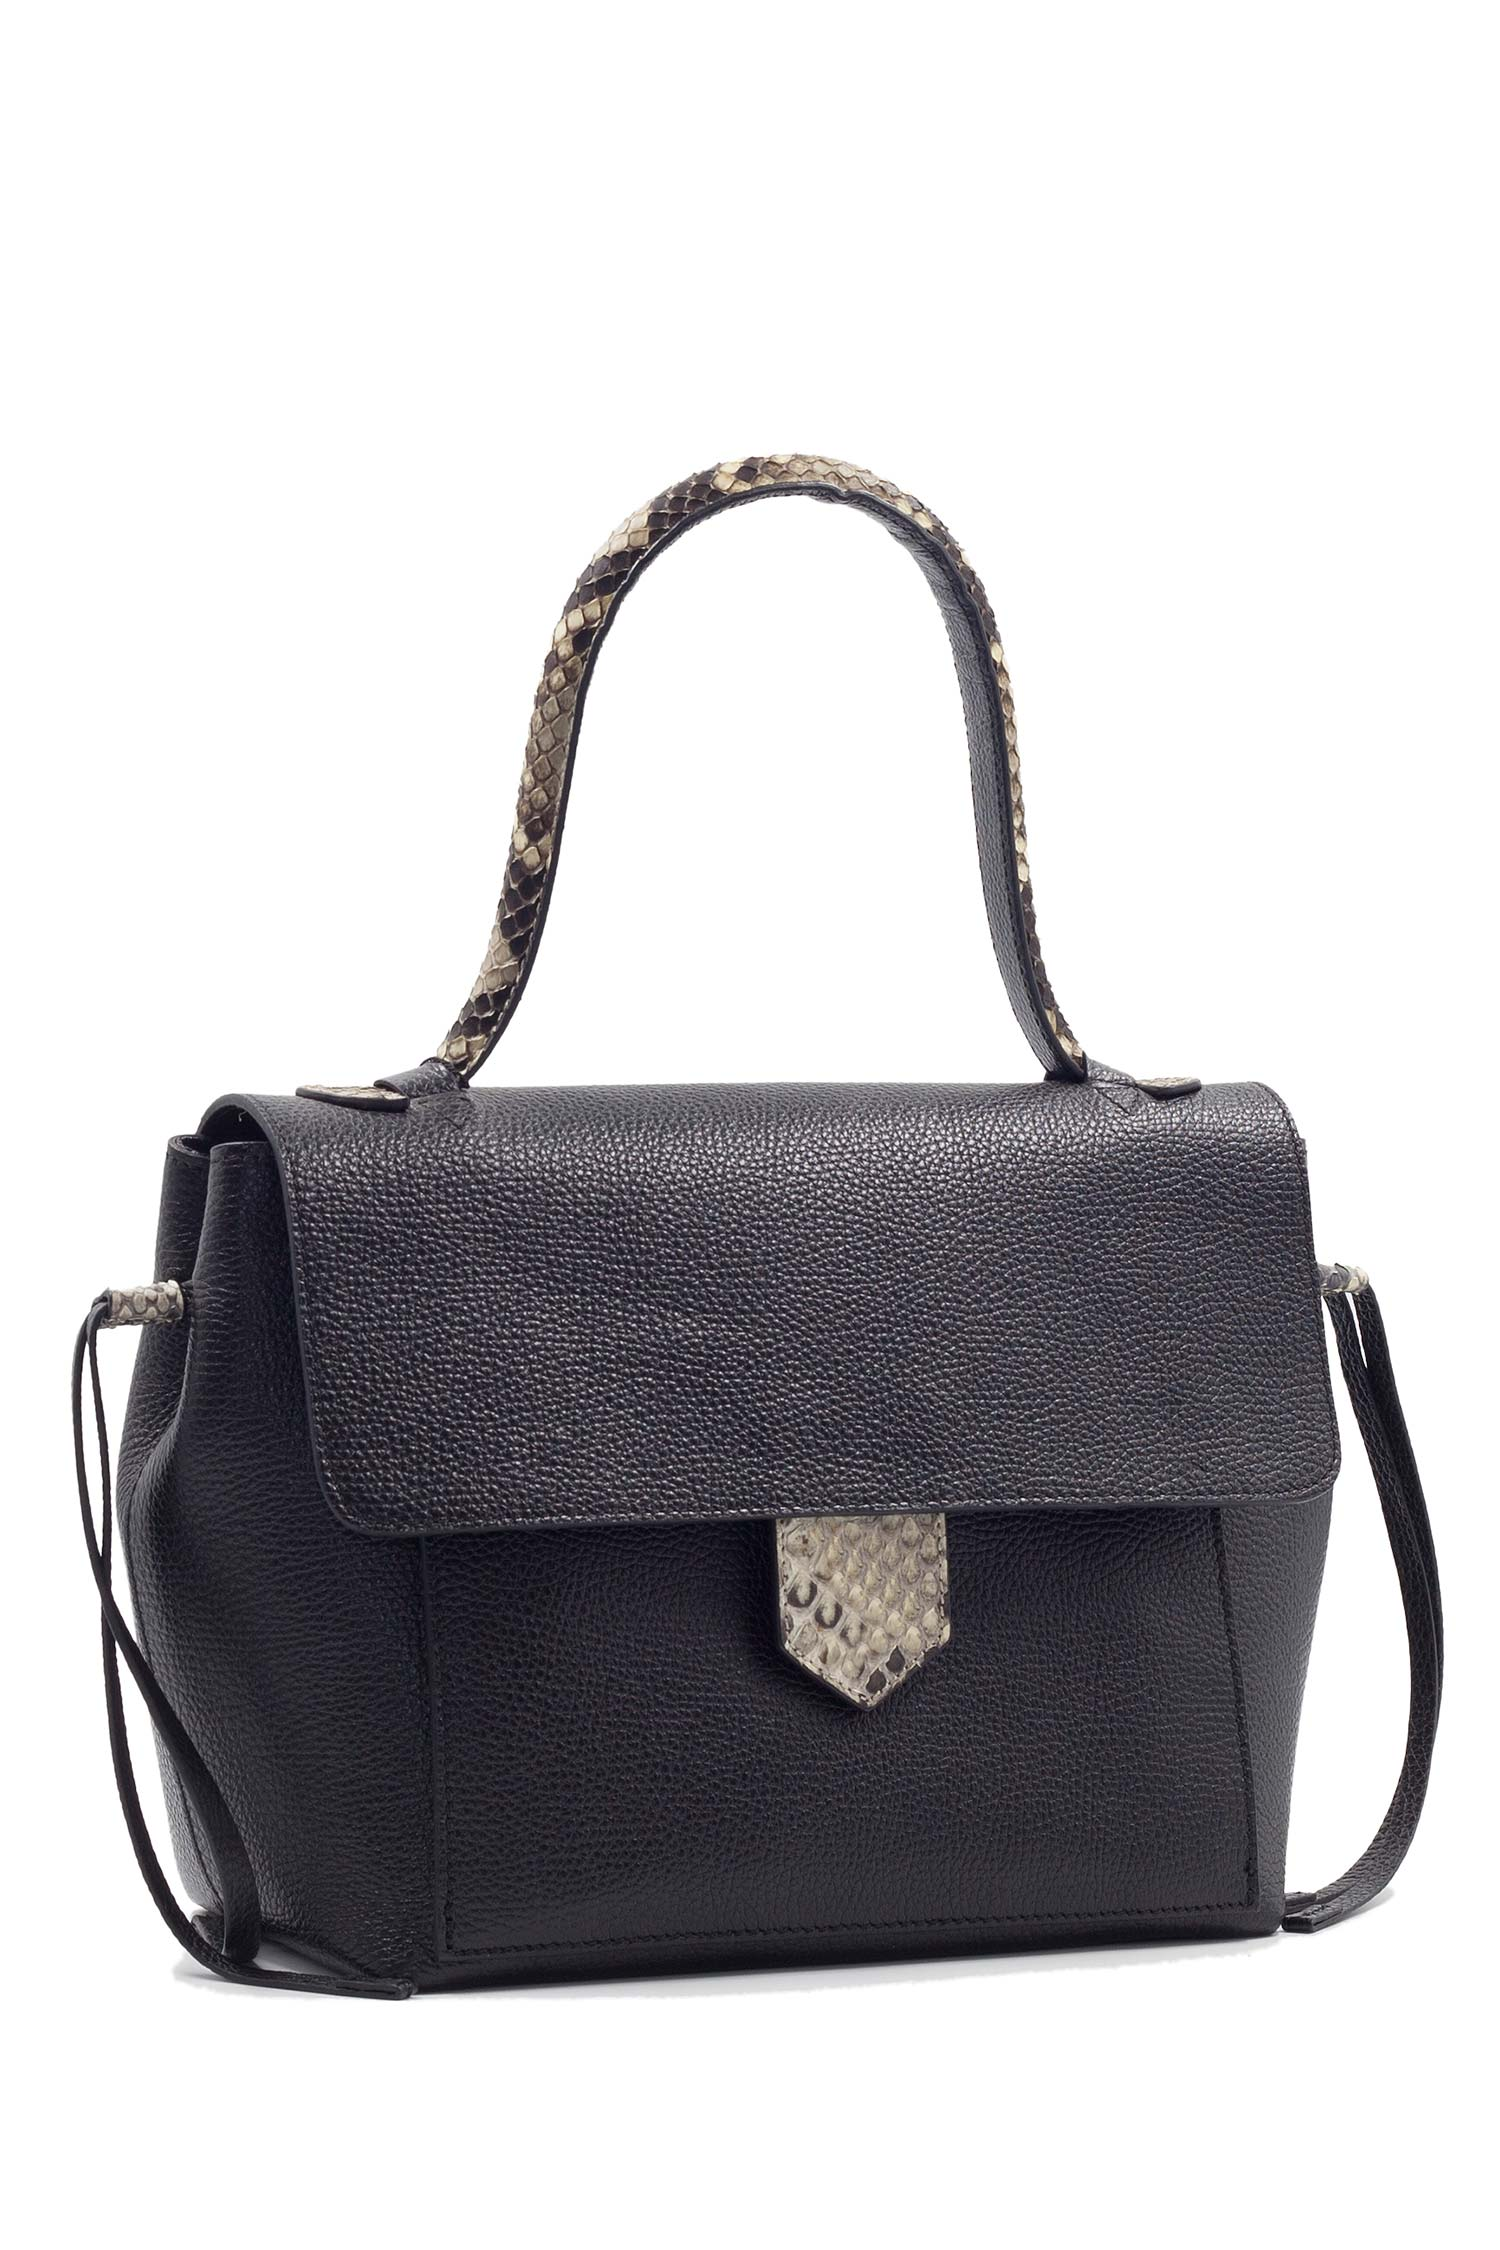 Competitive Price Unique Luxury Genuine Leather 2017 Woman Handbag